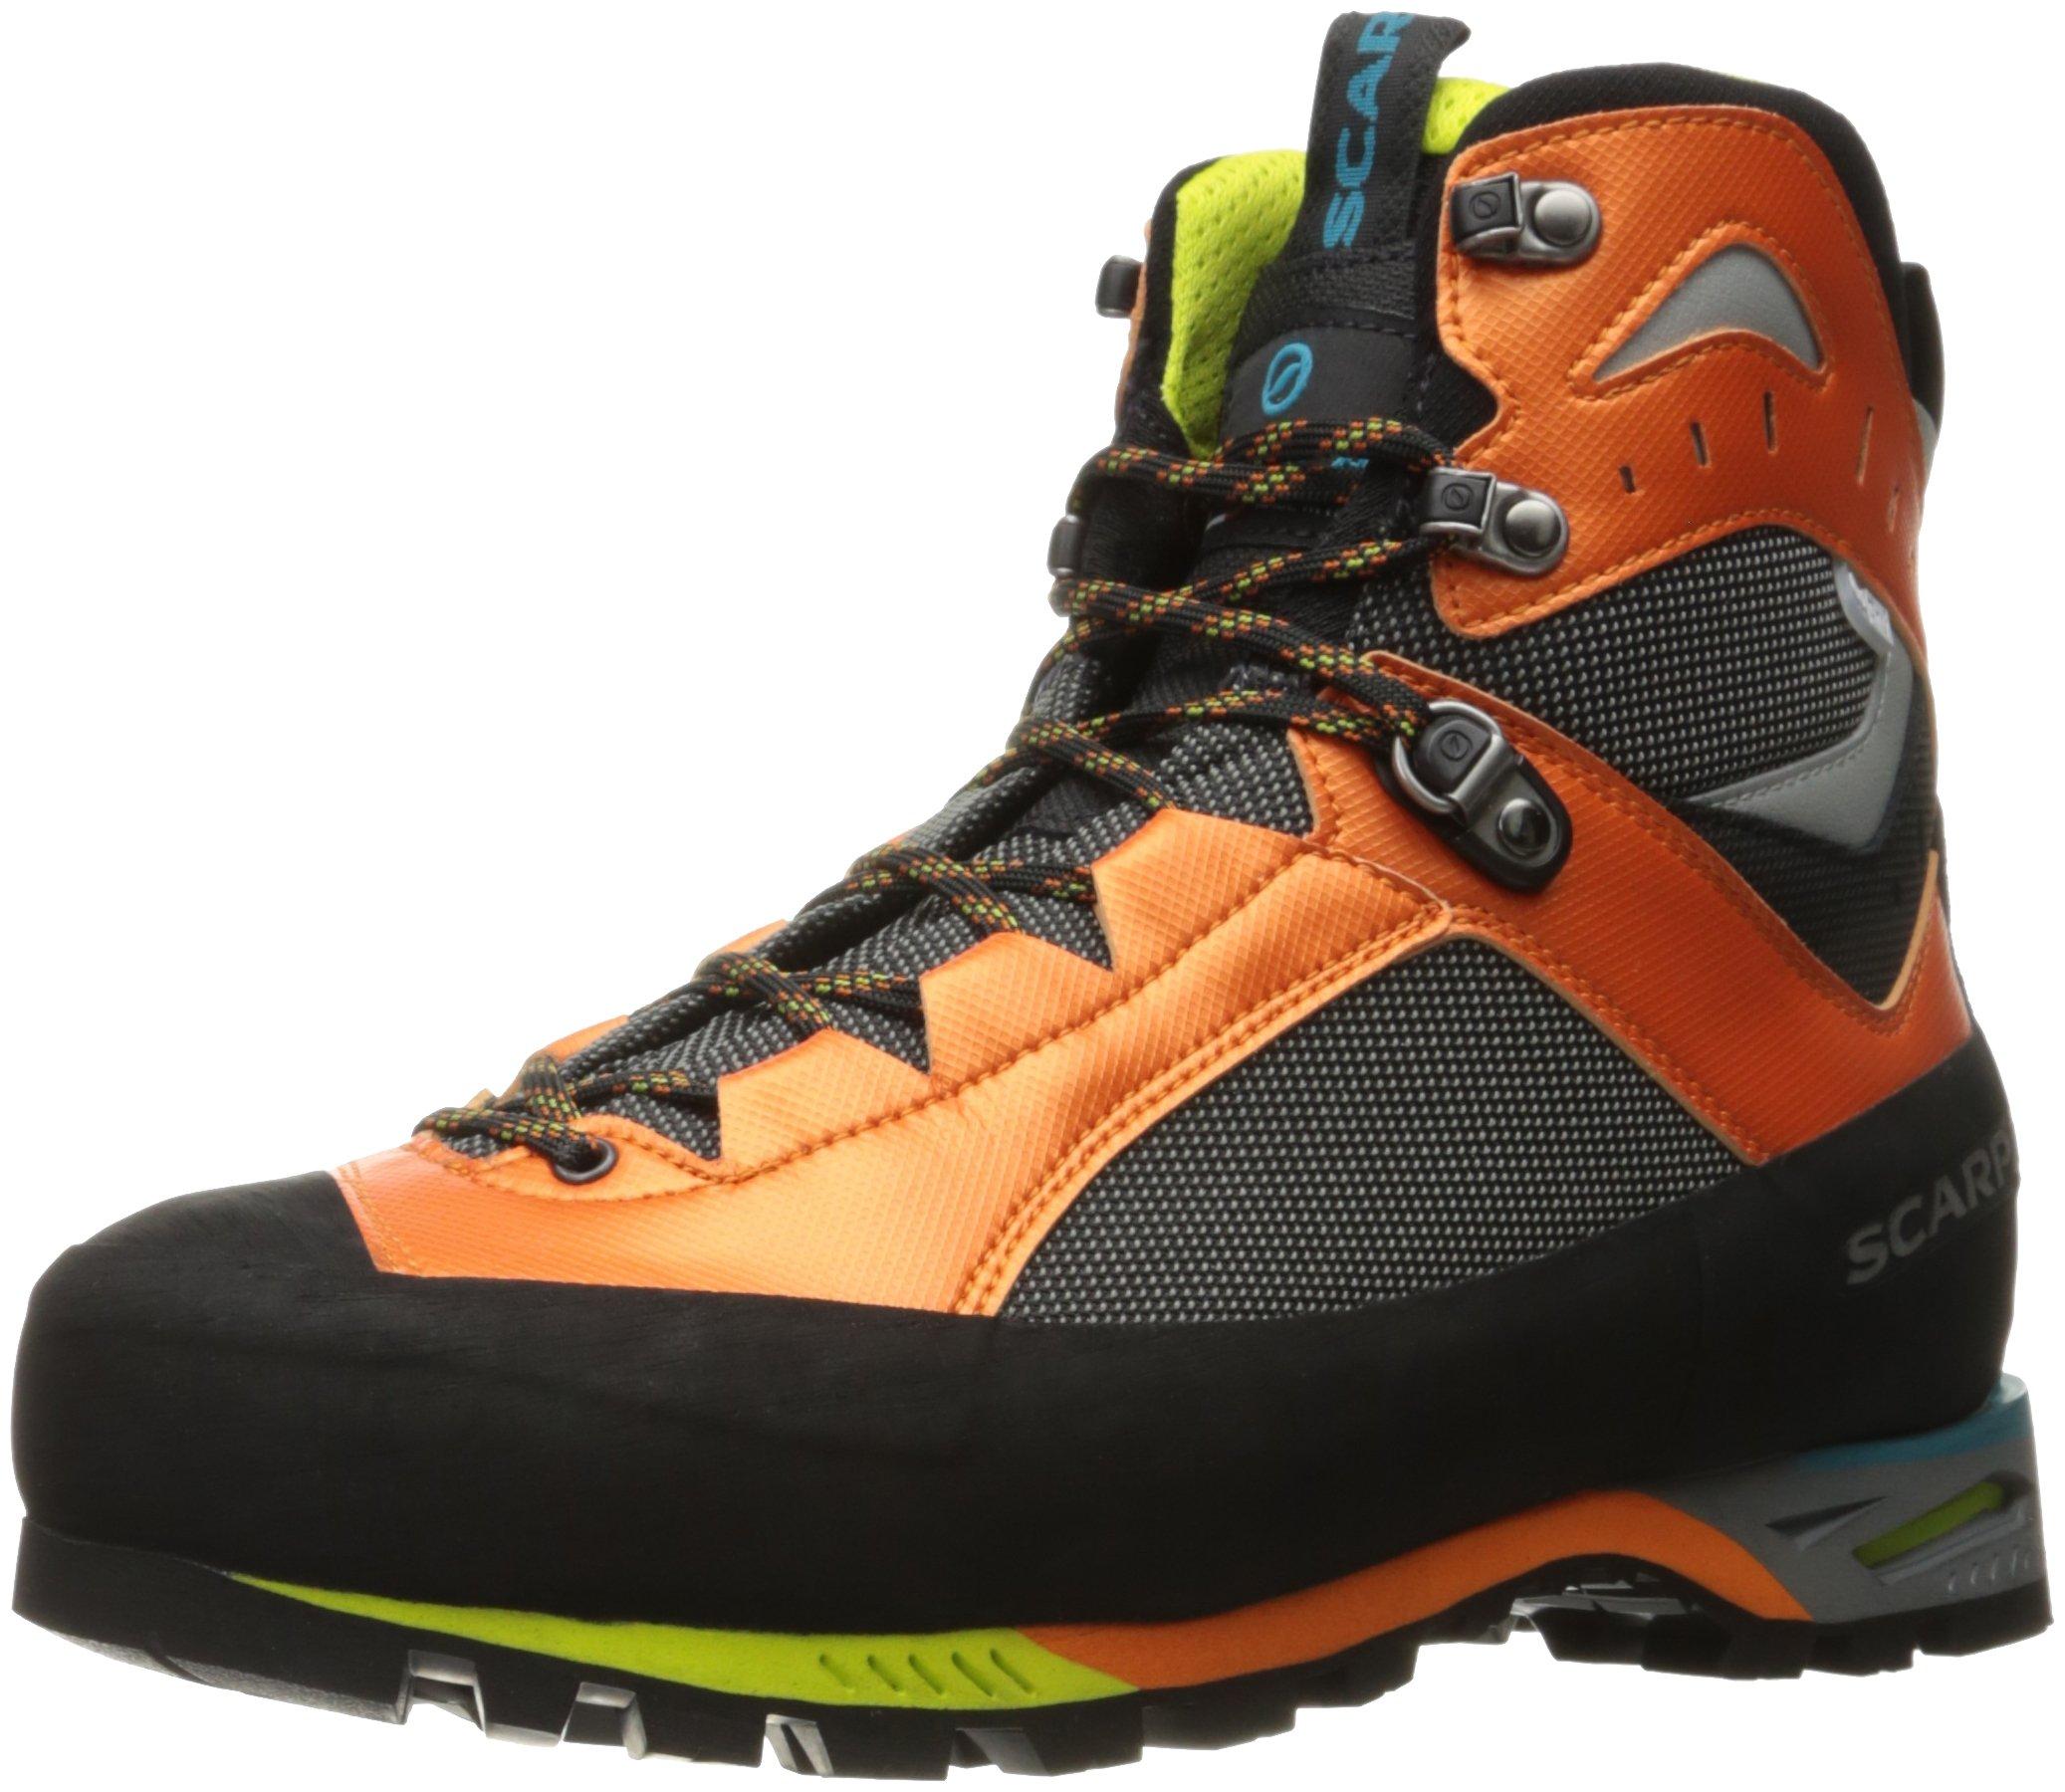 SCARPA Men's CHARMOZ Mountaineering Boot, Shark/Orange, 42.5 EU/9.5 M US by SCARPA